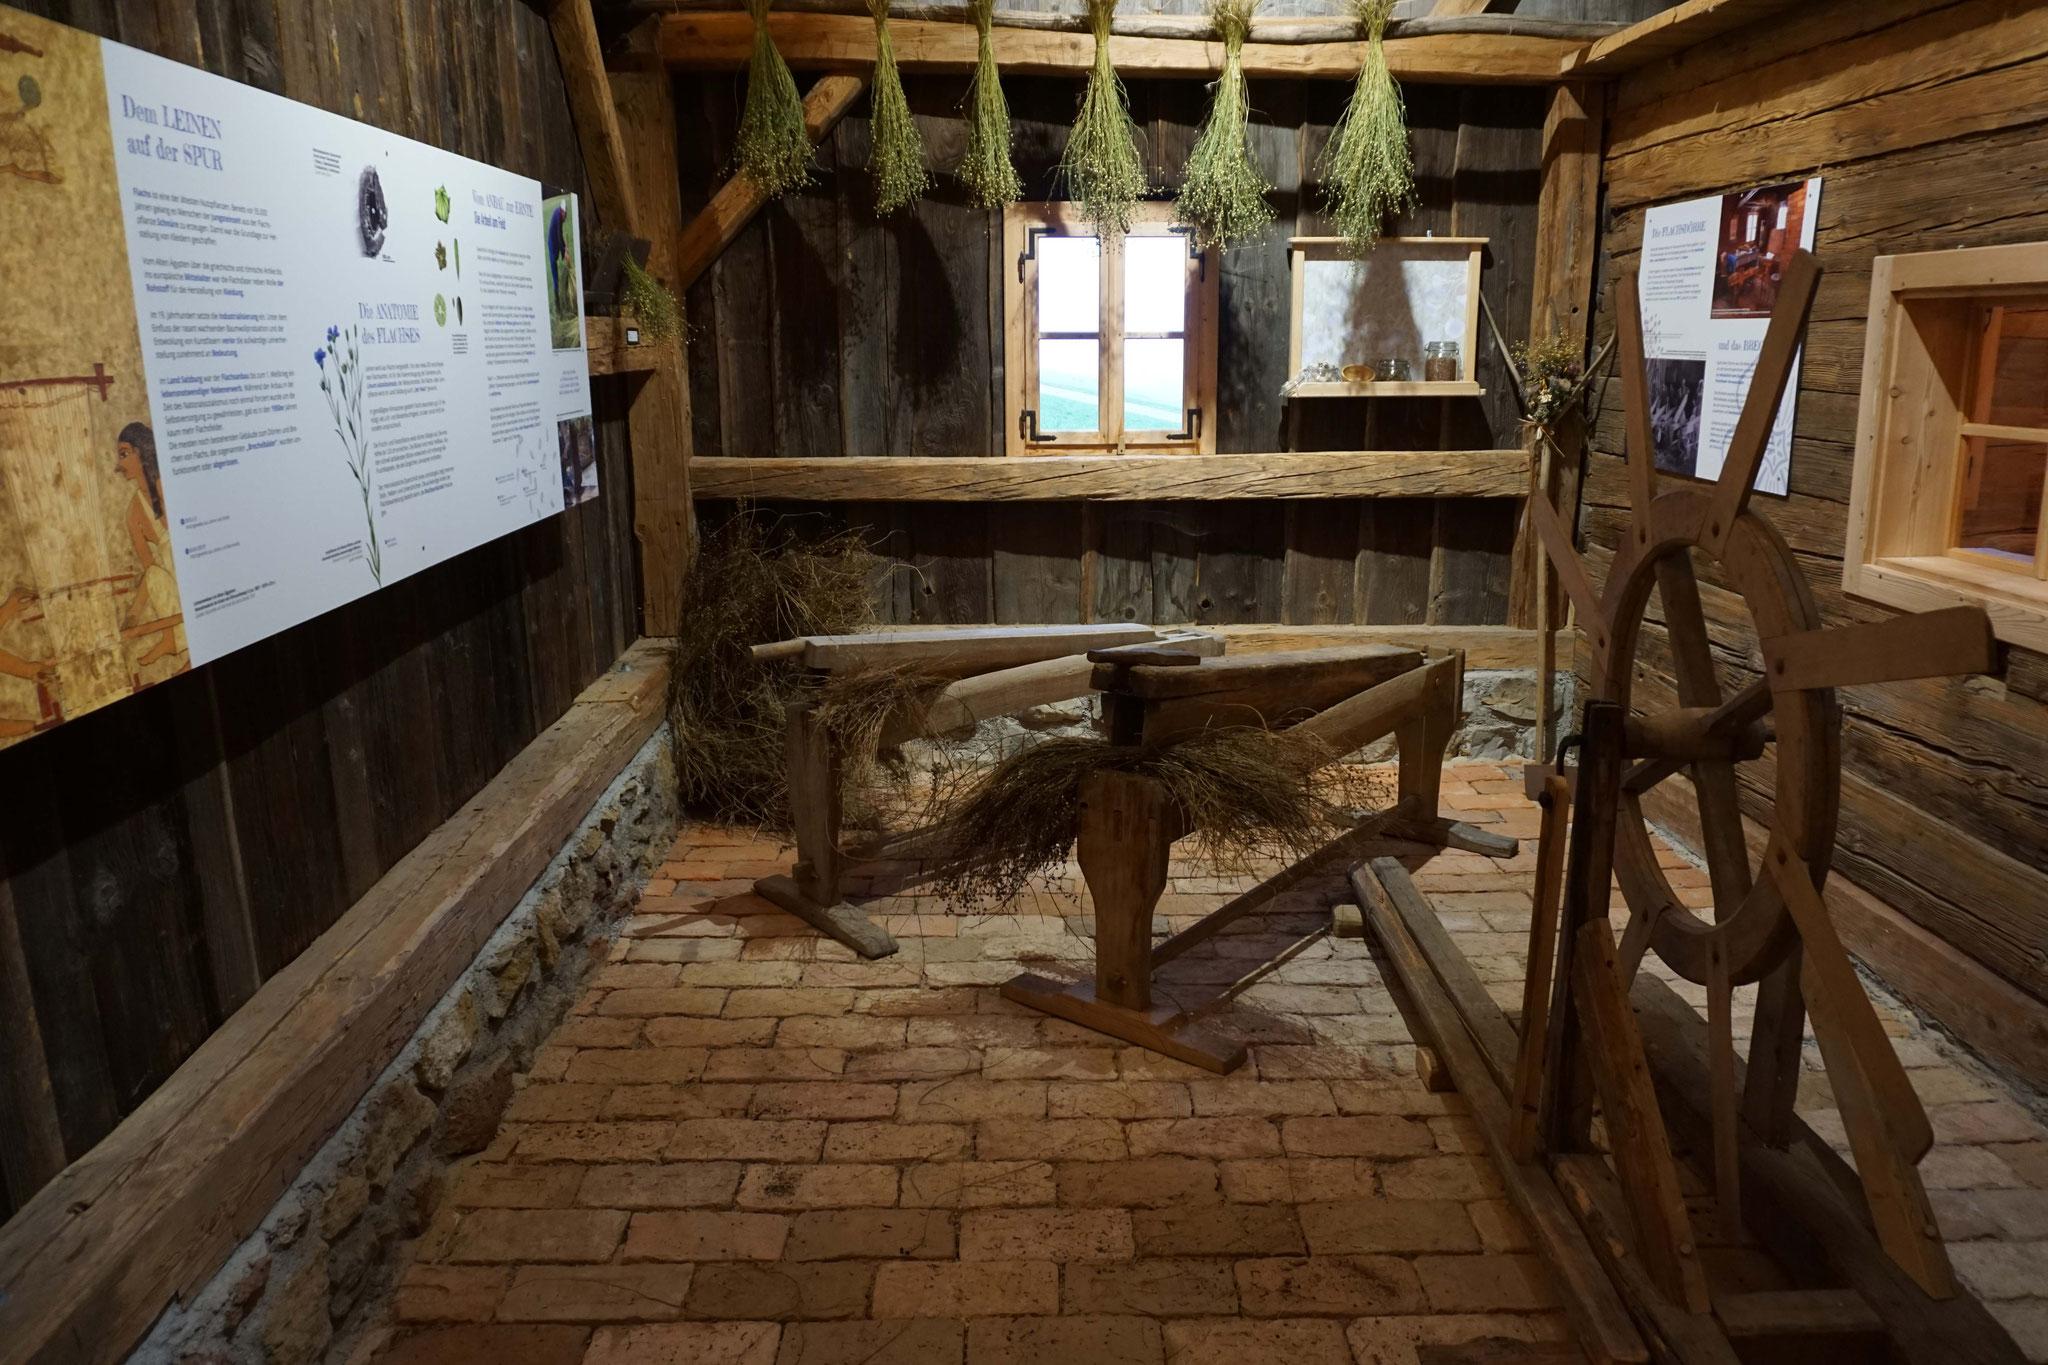 (c) Brechelbad Museum/Steiner